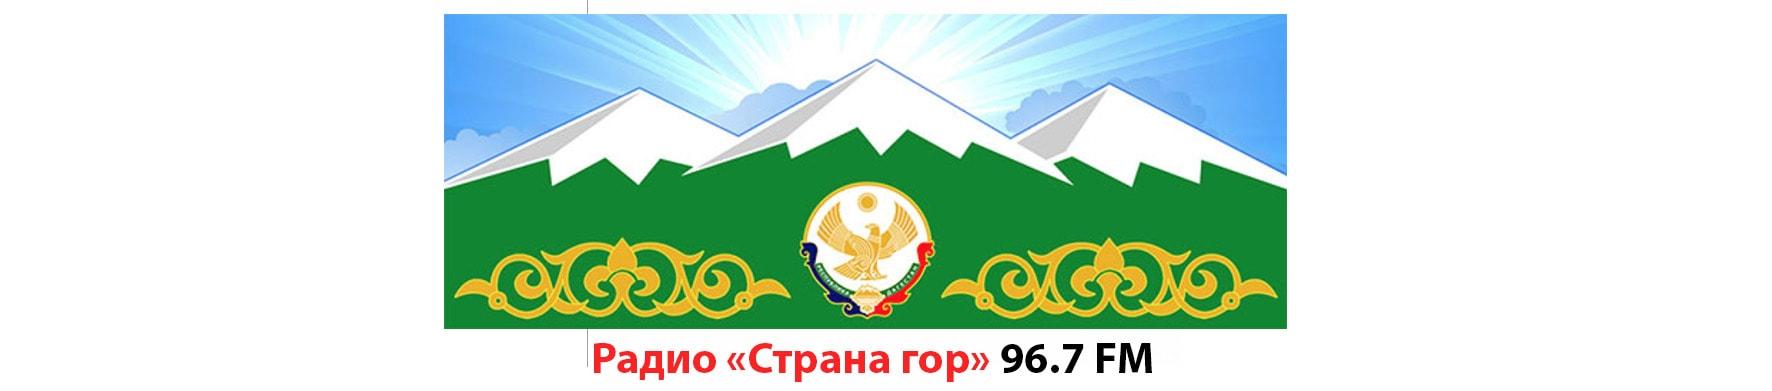 Реклама на радио в Дагестане страна гор